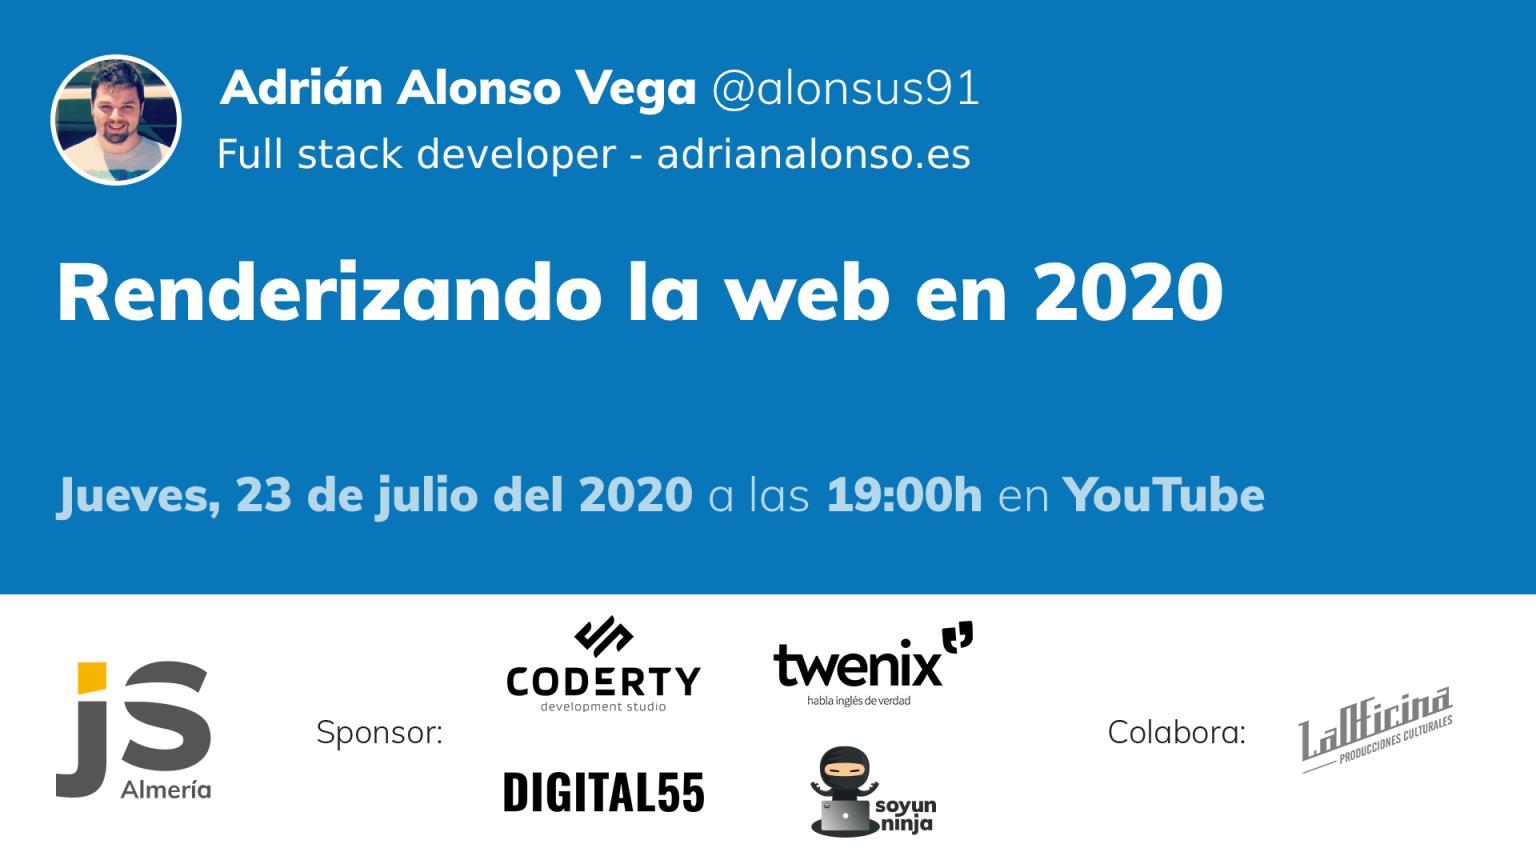 Renderizando la web en 2020